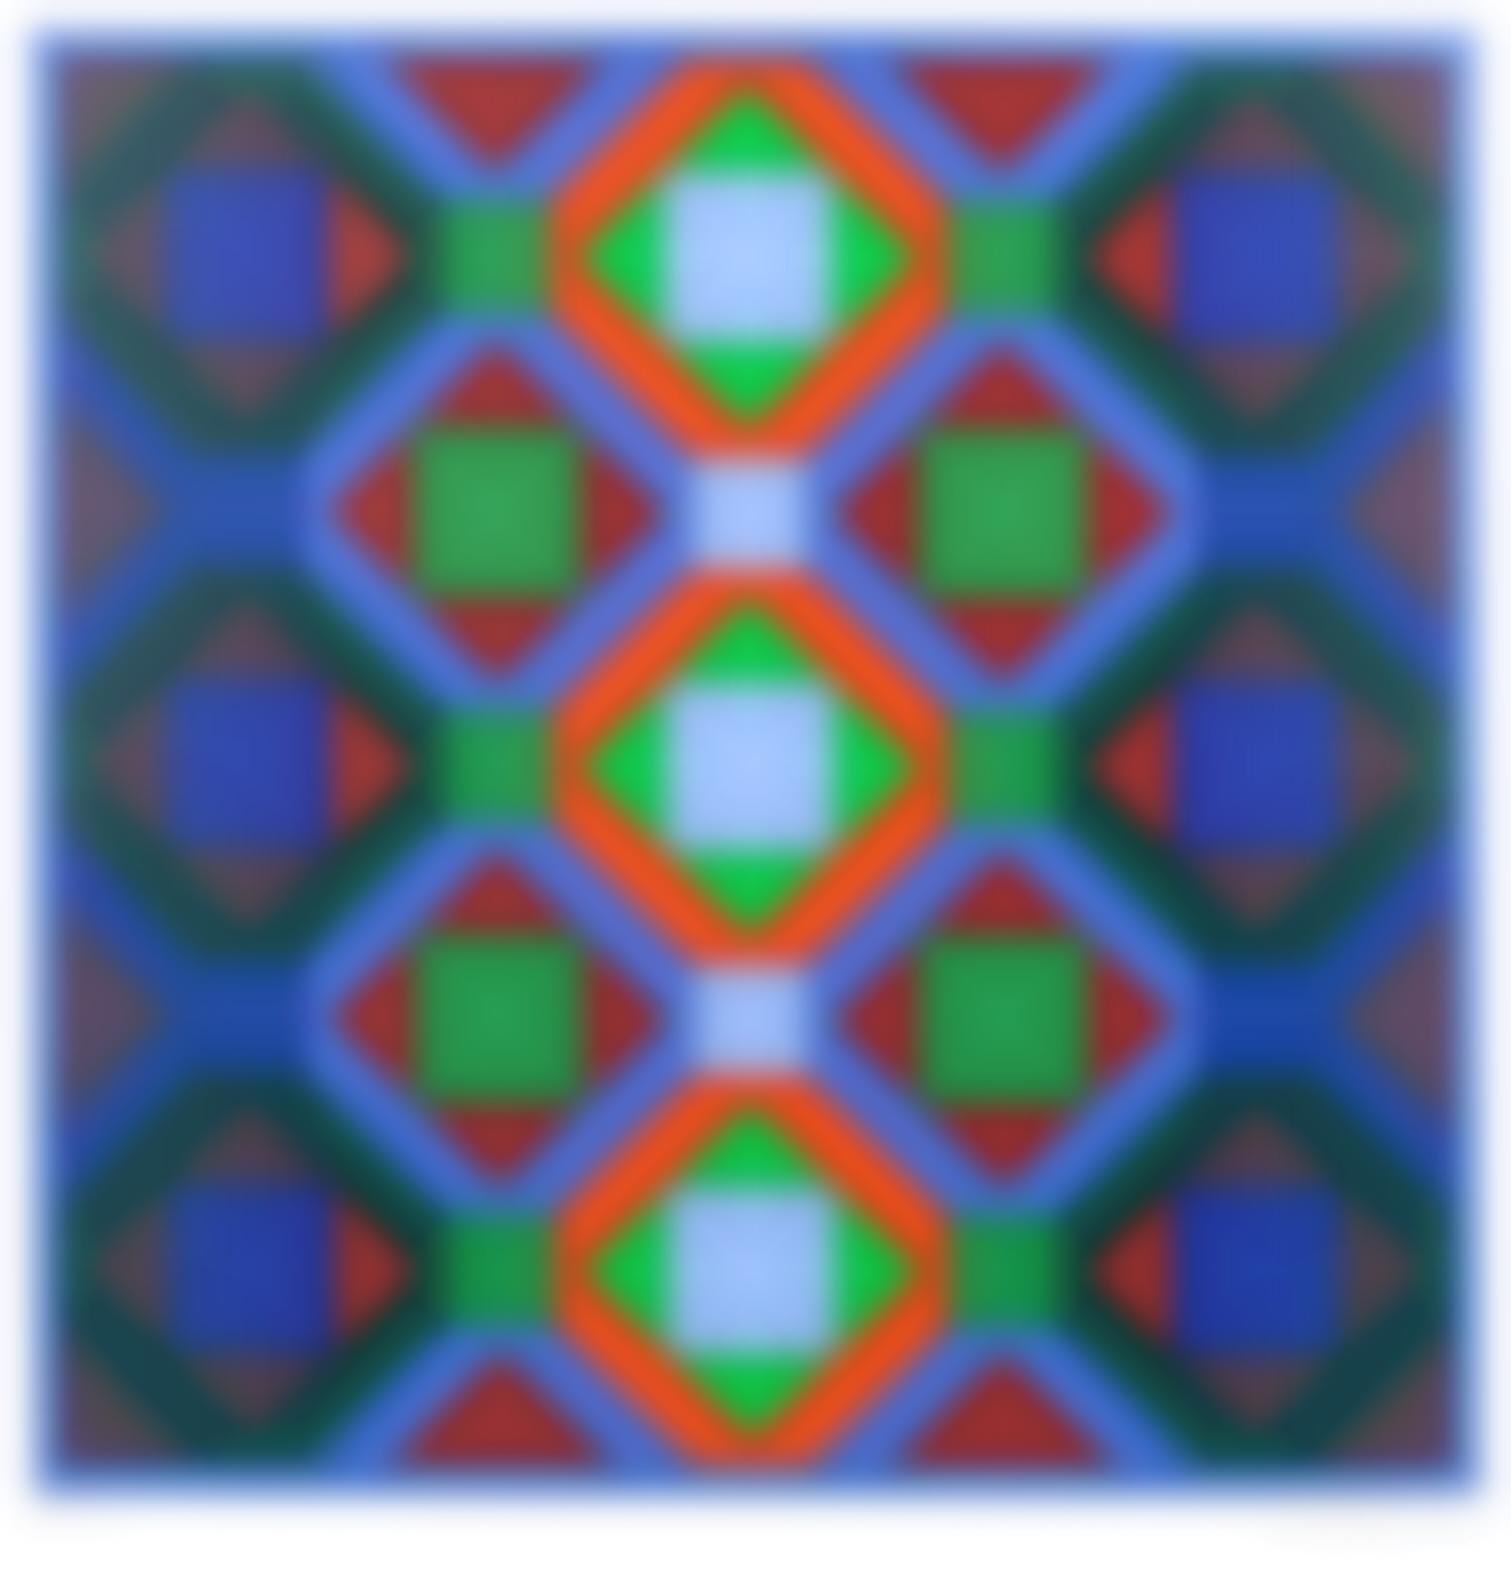 Victor Vasarely-Octagonal Structures-1969